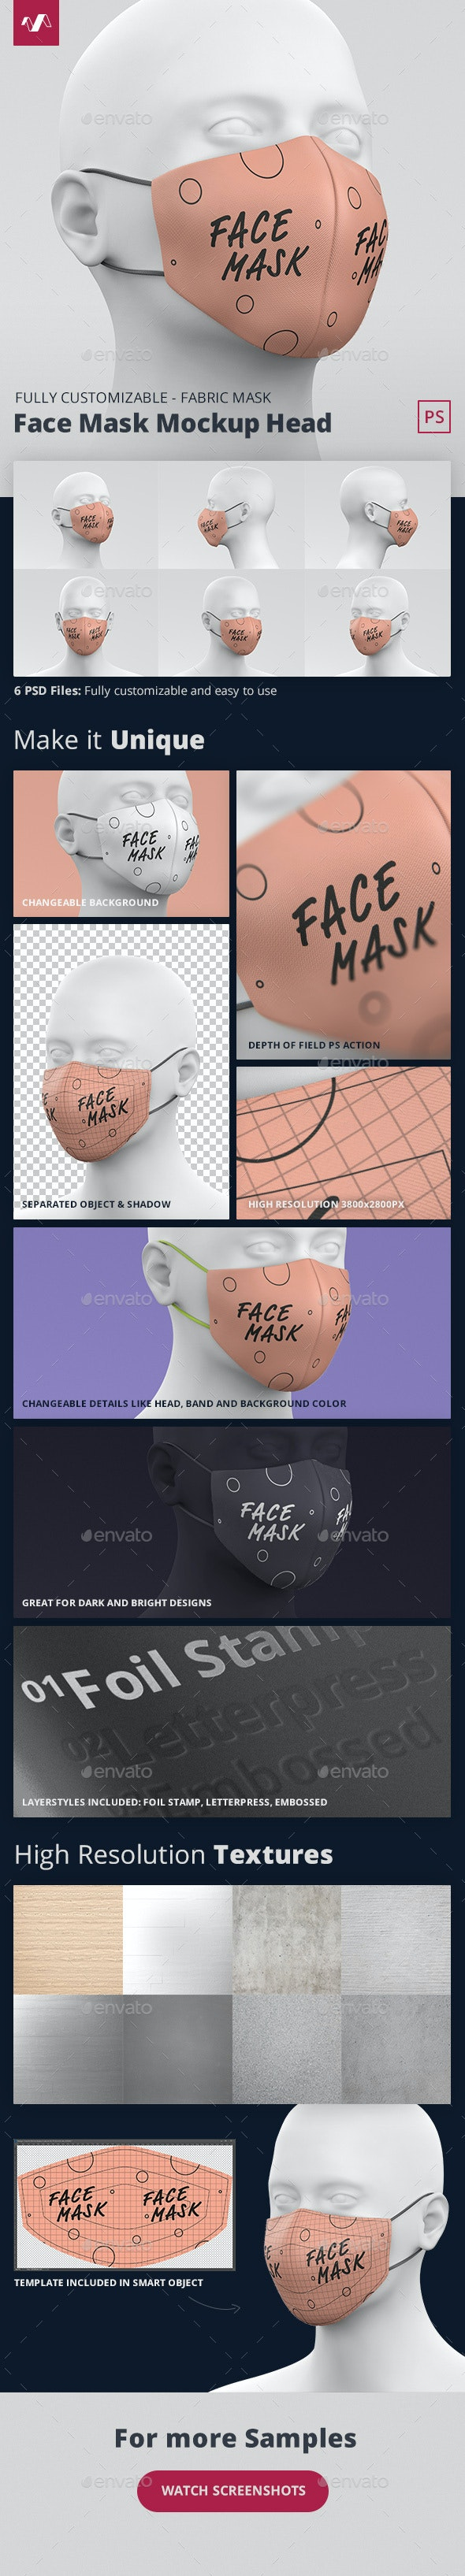 Face Mask Mockup Head Fabric - Miscellaneous Apparel